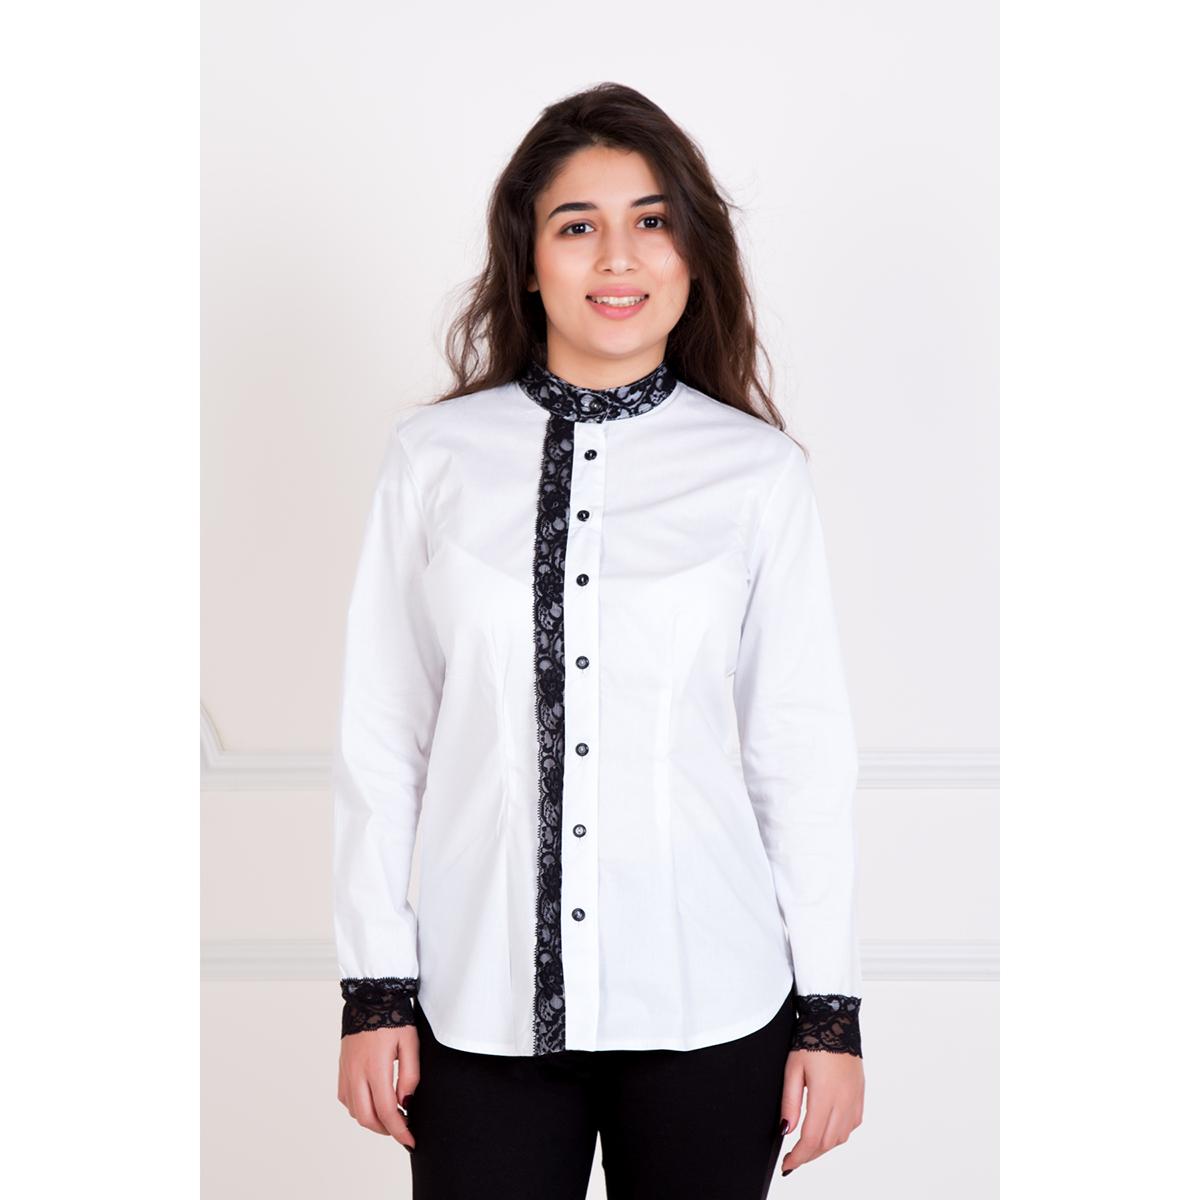 Женская рубашка Владлена, размер 50Рубашки<br>Обхват груди:100 см<br>Обхват талии:82 см<br>Обхват бедер:108 см<br>Рост:167 см<br><br>Тип: Жен. рубашка<br>Размер: 50<br>Материал: Хлопок